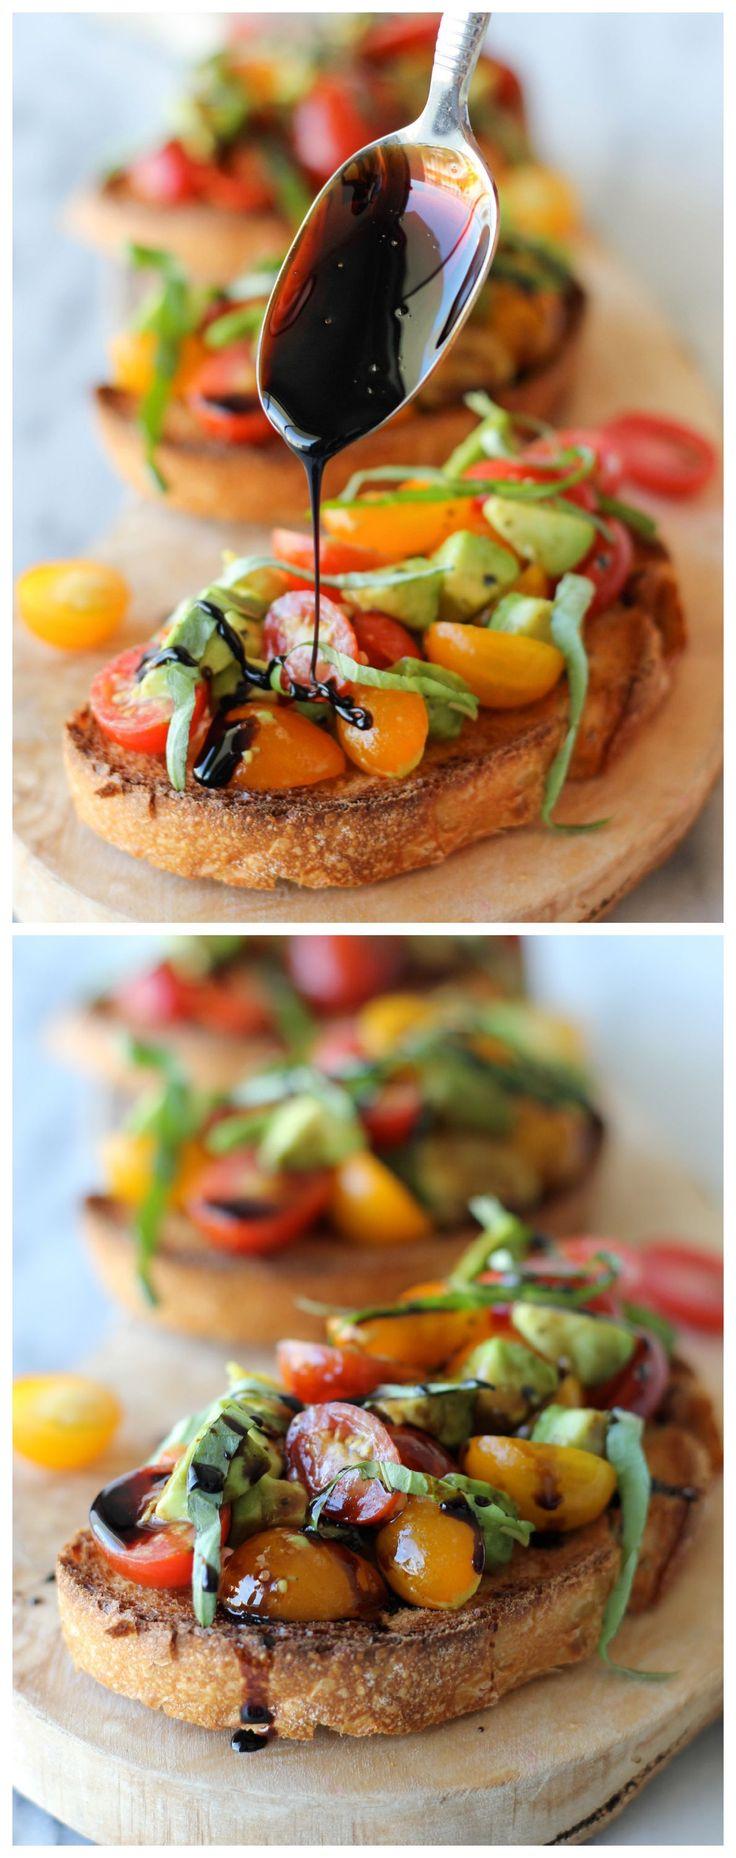 Avocado Bruschetta with Balsamic Reduction - Damn Delicious